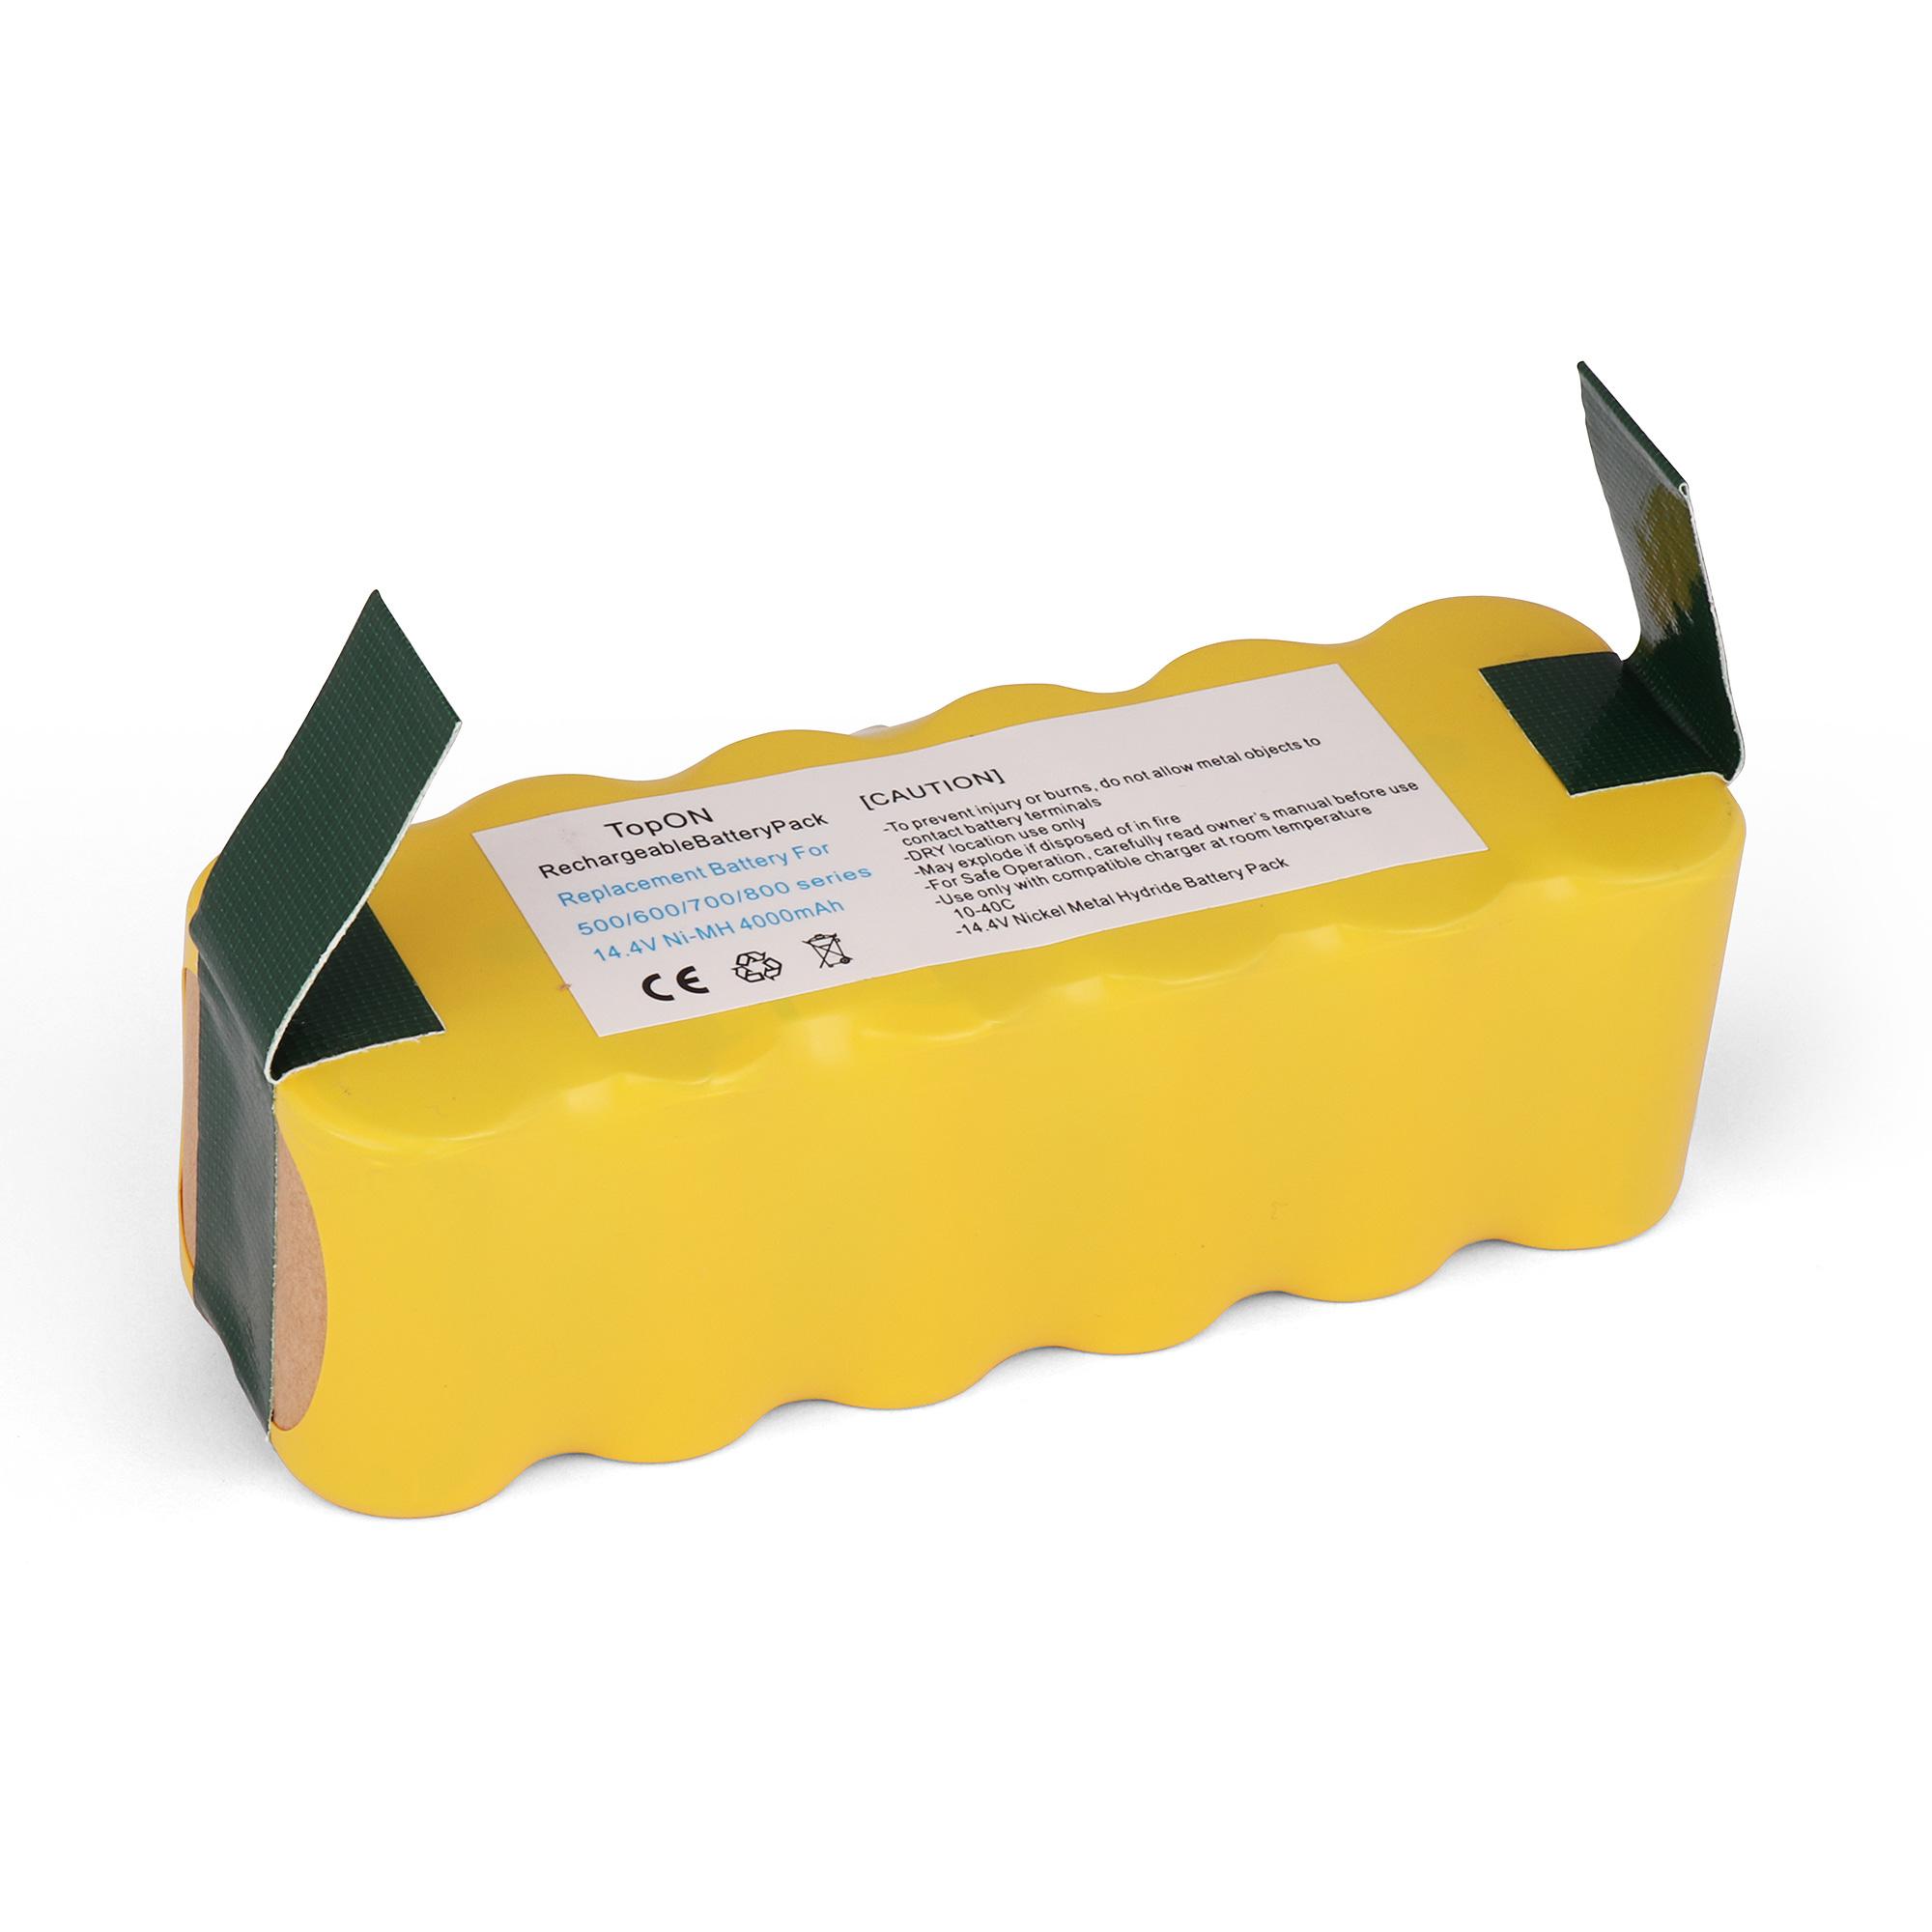 Аккумулятор для пылесоса TopON iRobot Roomba 500, 600, 700, 800, 900 Series. 14.4V 4000mAh Ni-MH. PN: 80501, GD-ROOMBA-500, VAC-500NMH-33.